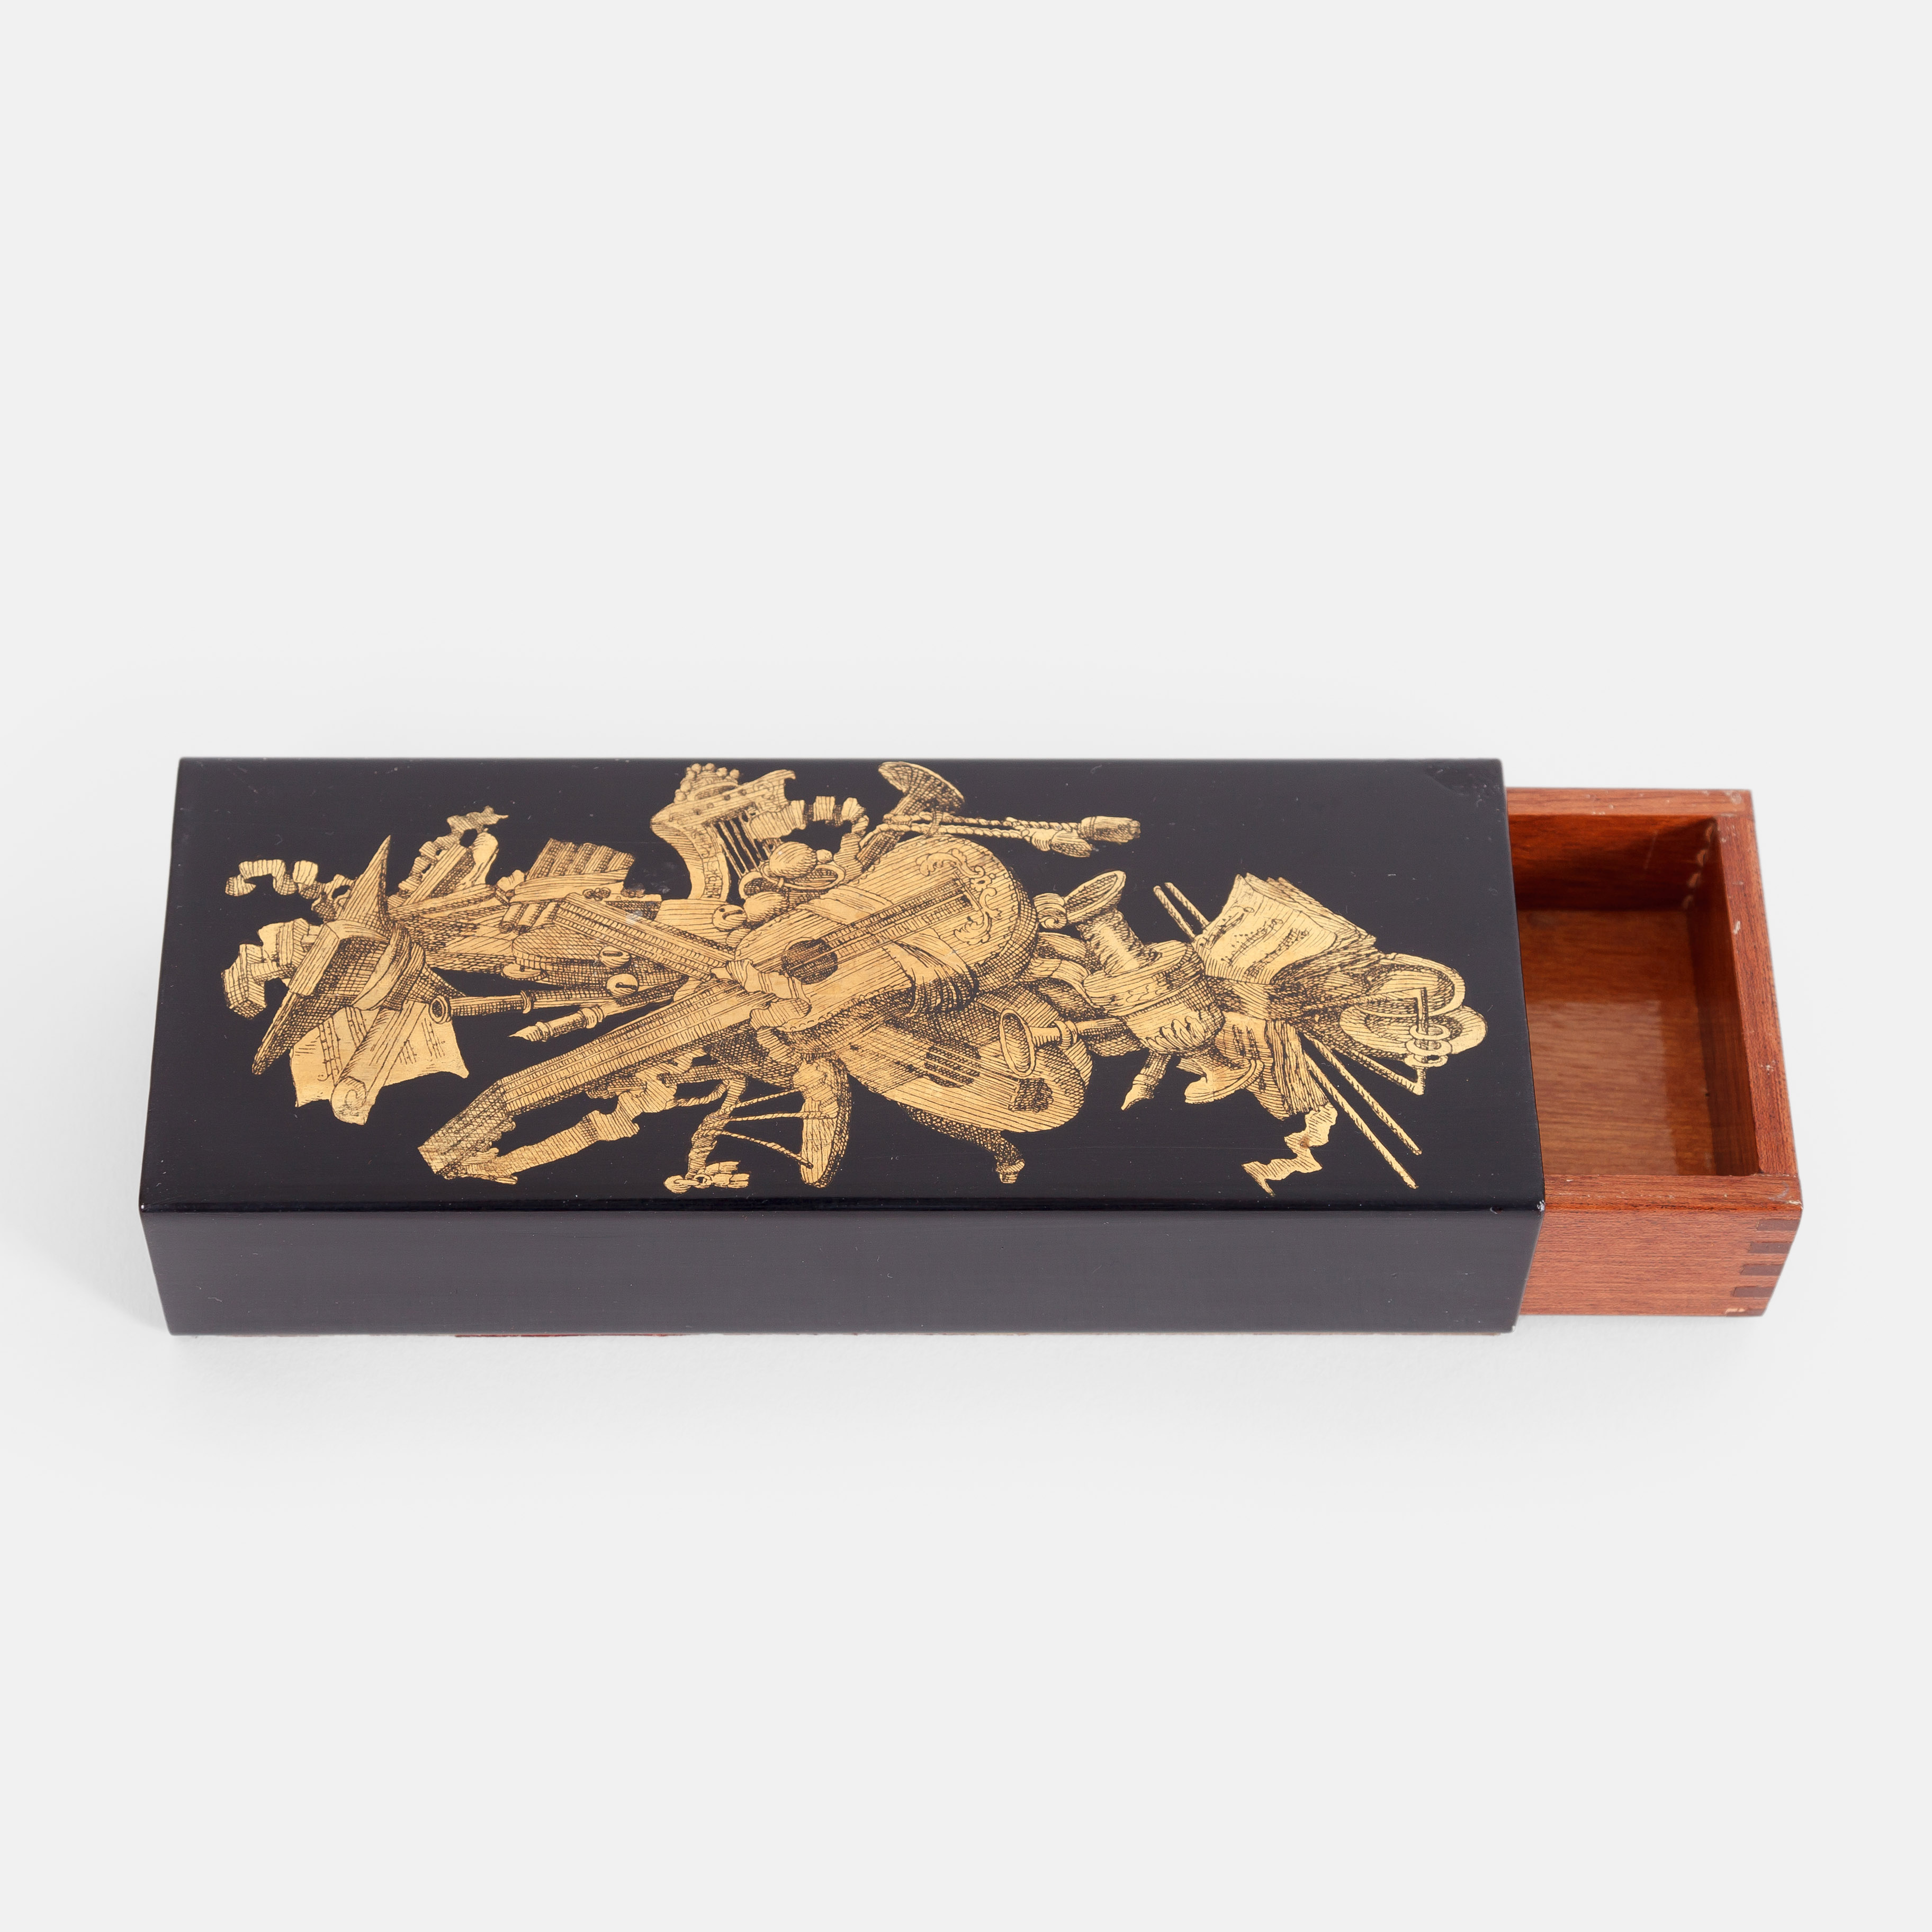 'Trofei Musica' Box by Piero Fornasetti   soyun k.